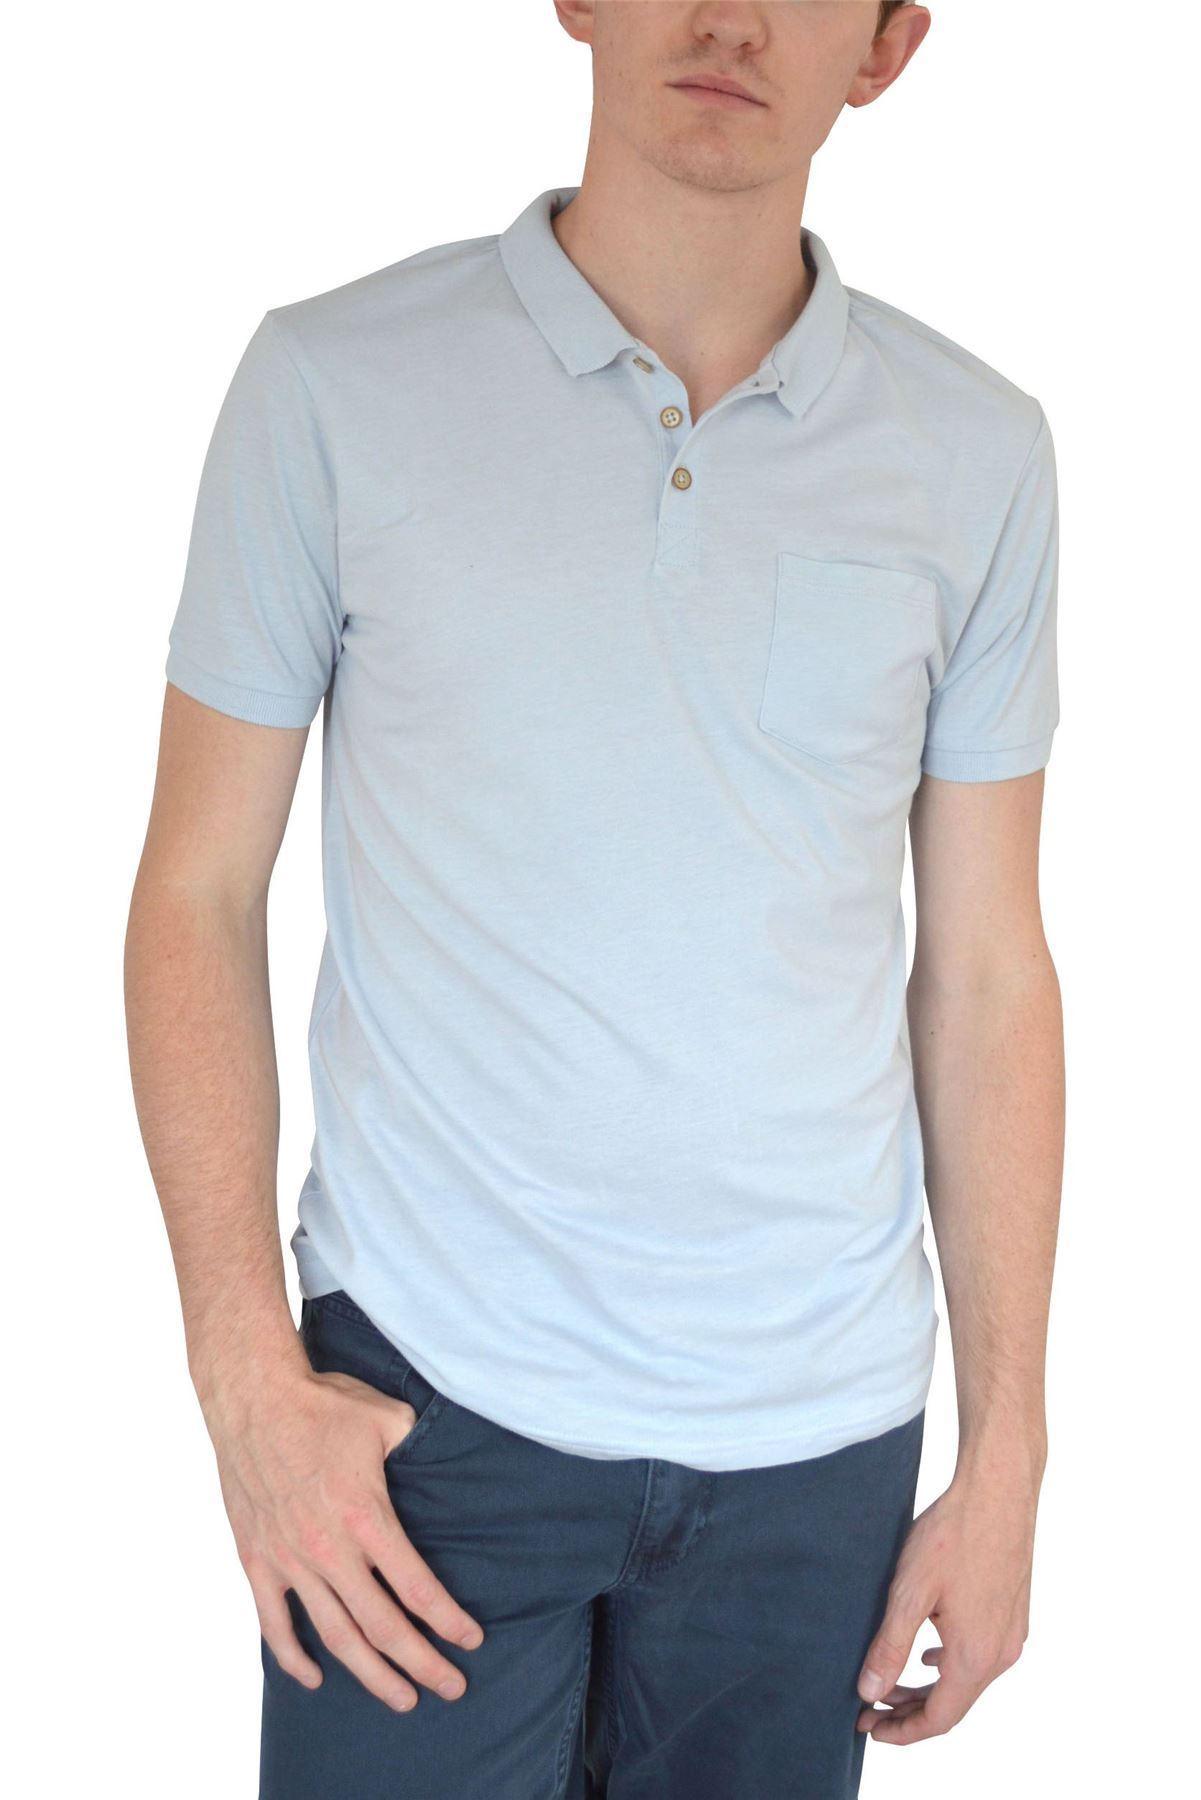 Ex-Mens-H-amp-M-Cotton-Polo-Shirt-Contrast-Collar-Size-S-XXL thumbnail 10